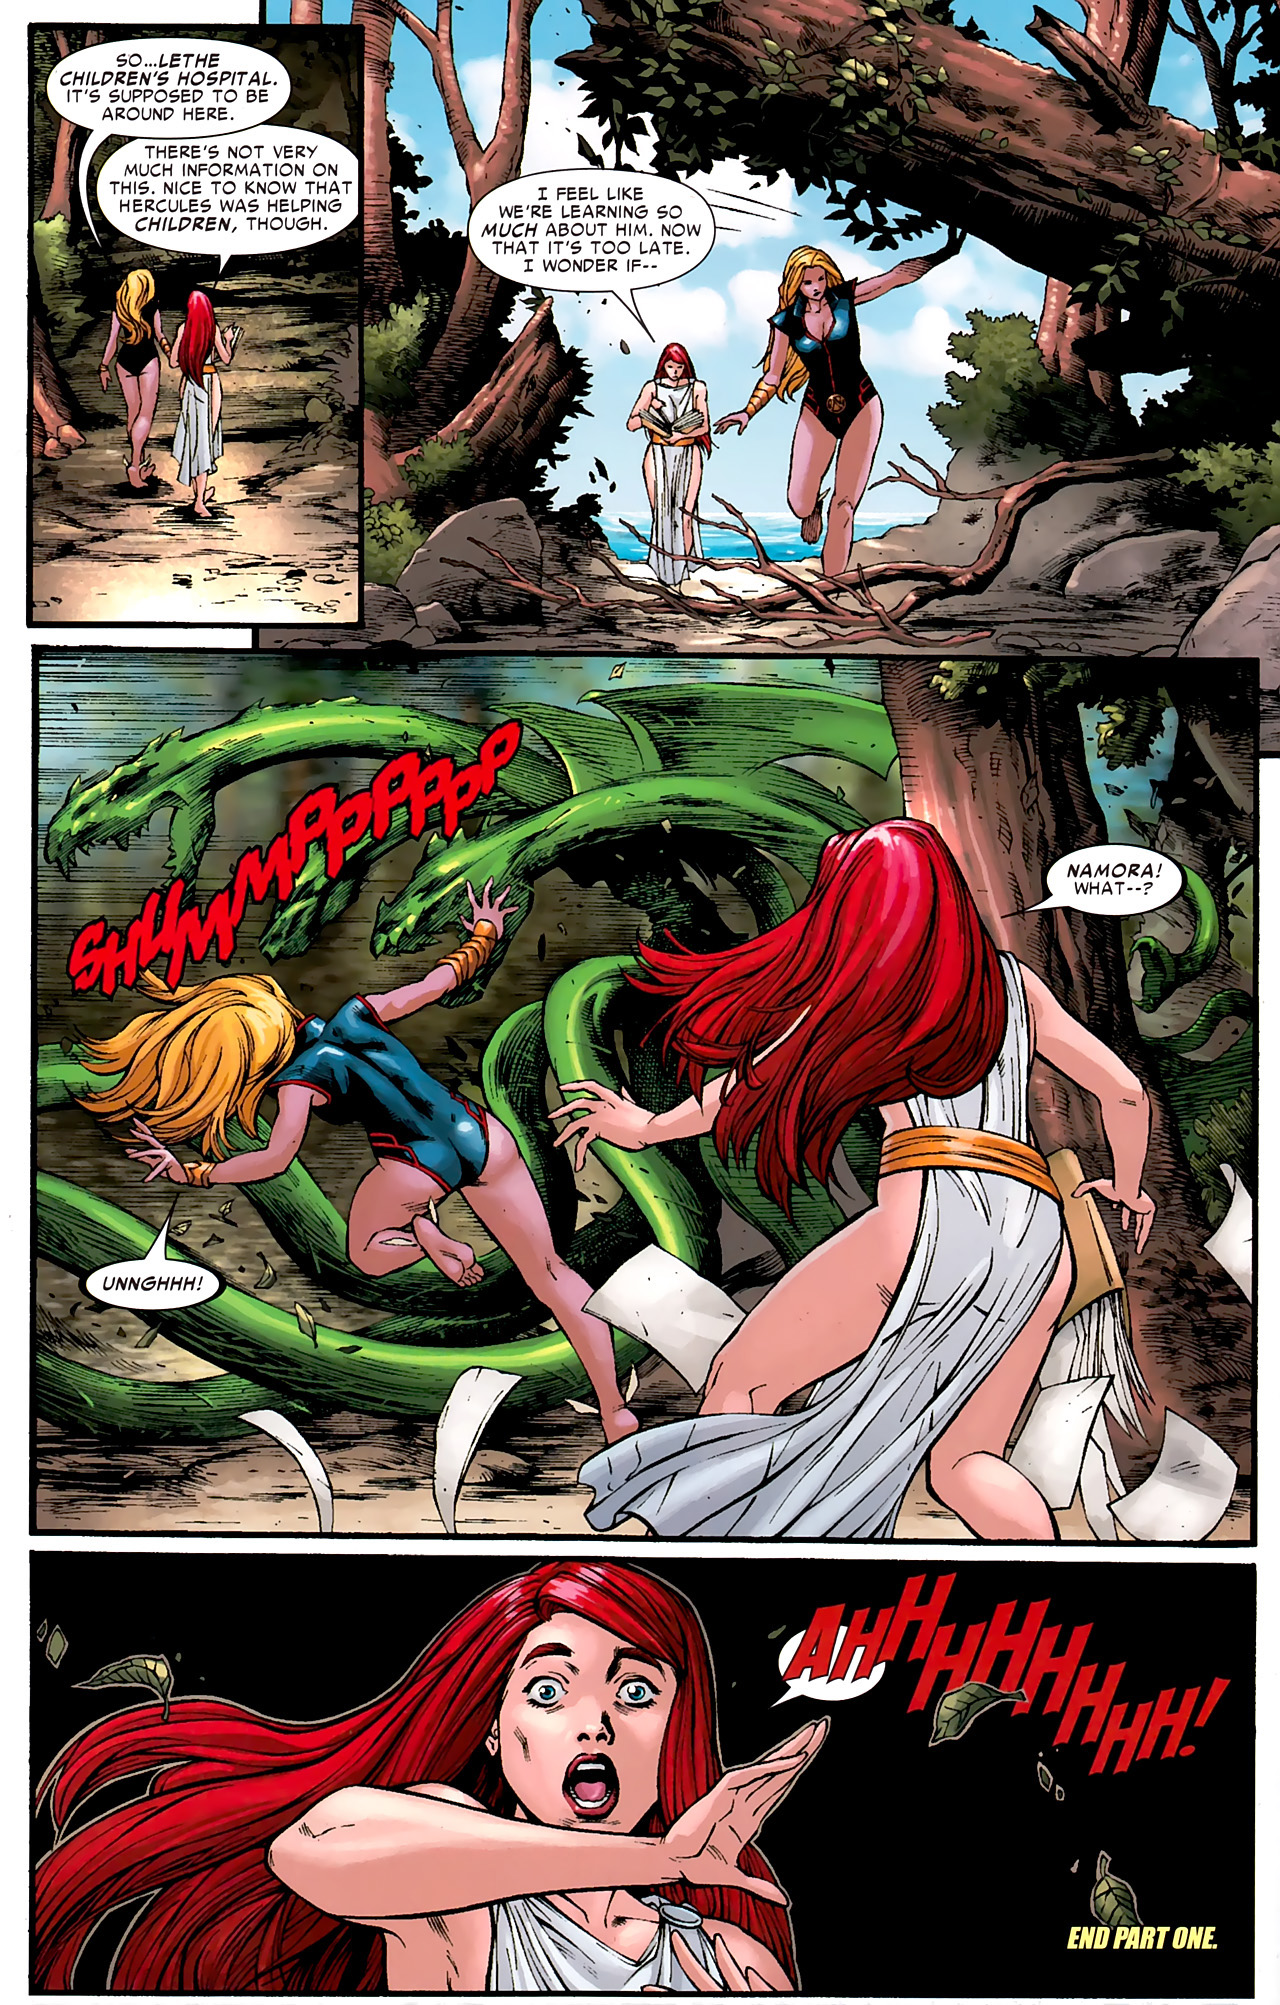 Read online Hercules: Fall of an Avenger comic -  Issue #1 - 31